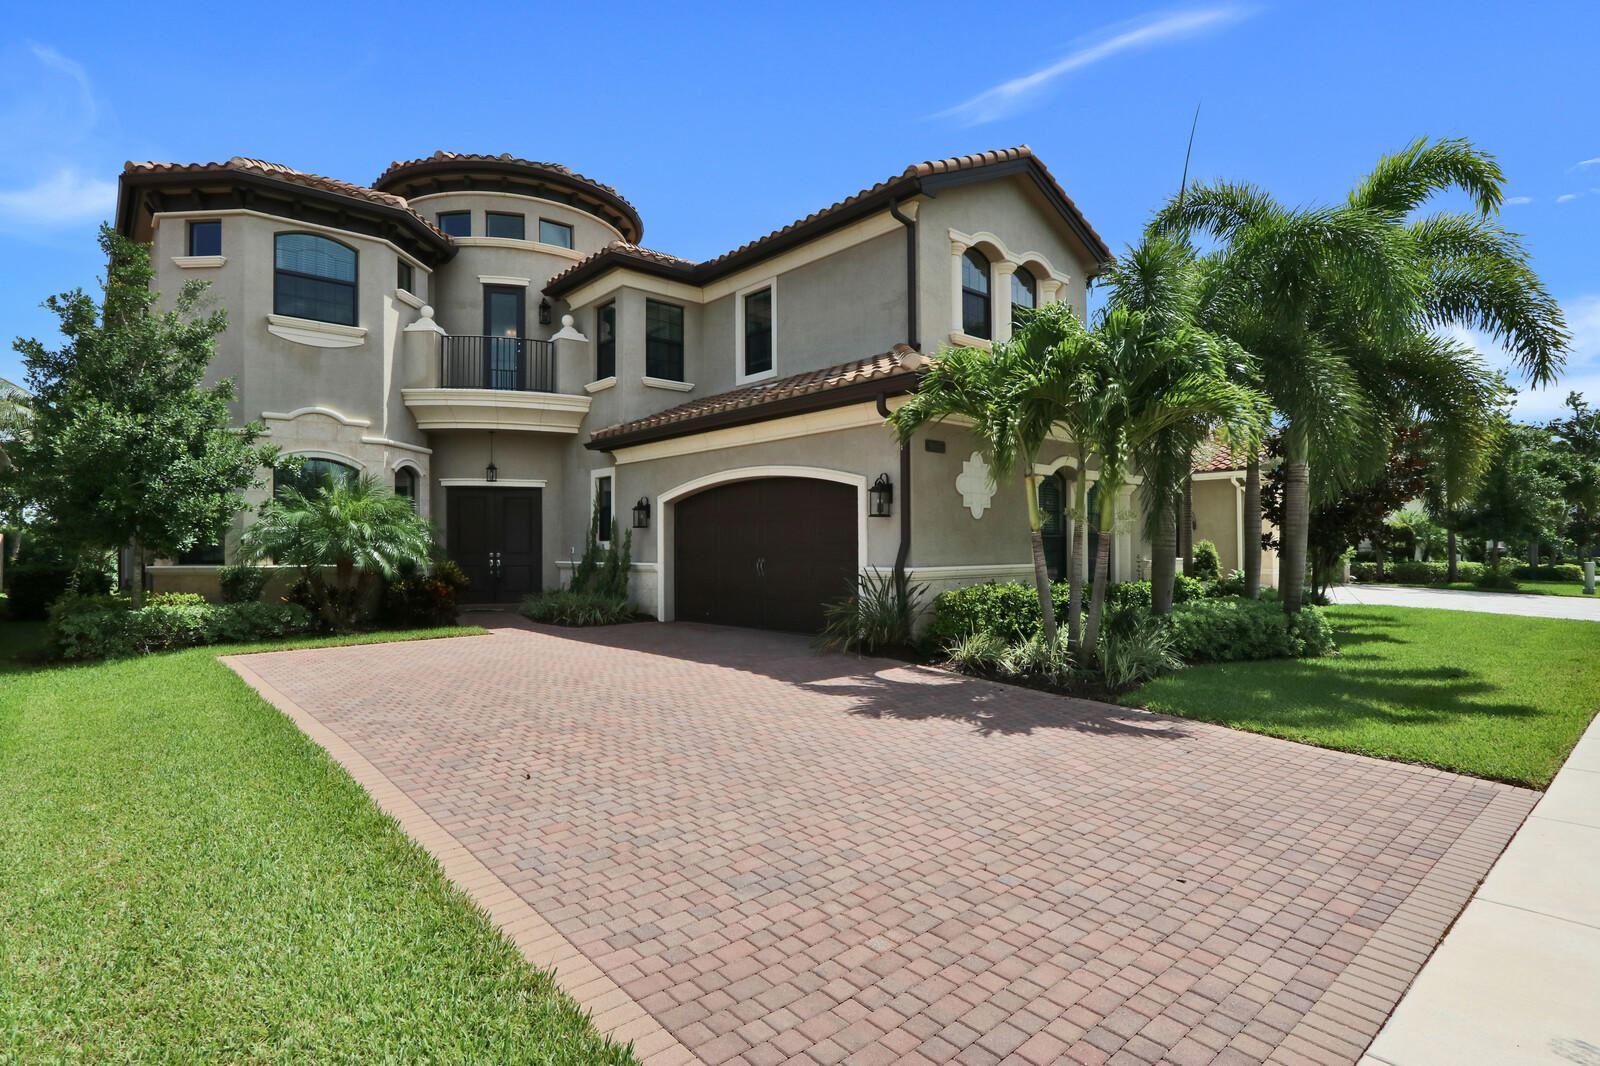 9095 Moriset Court, Delray Beach, FL 33446 - #: RX-10636874